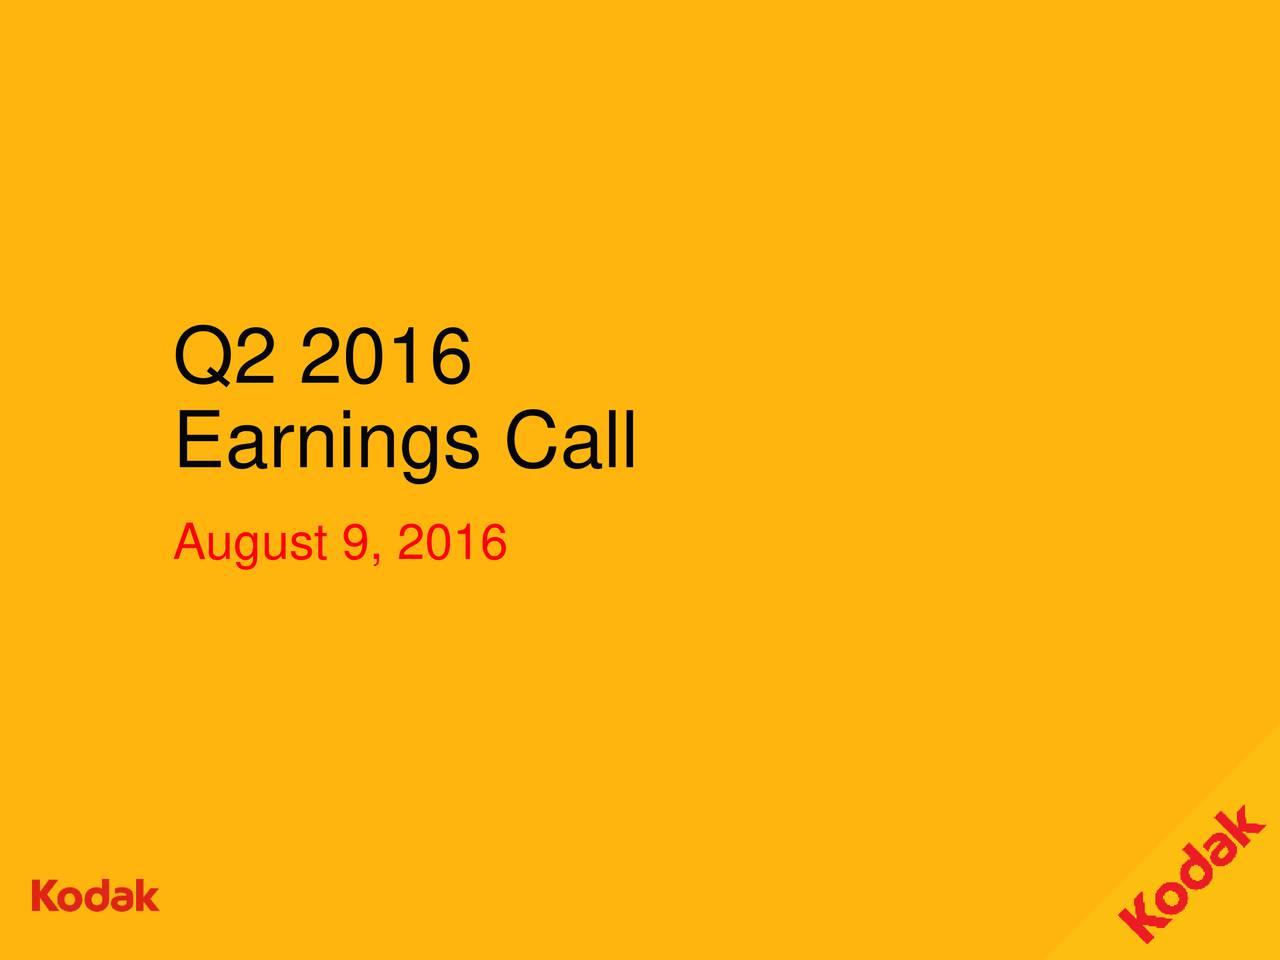 Earnings Call August 9, 2016